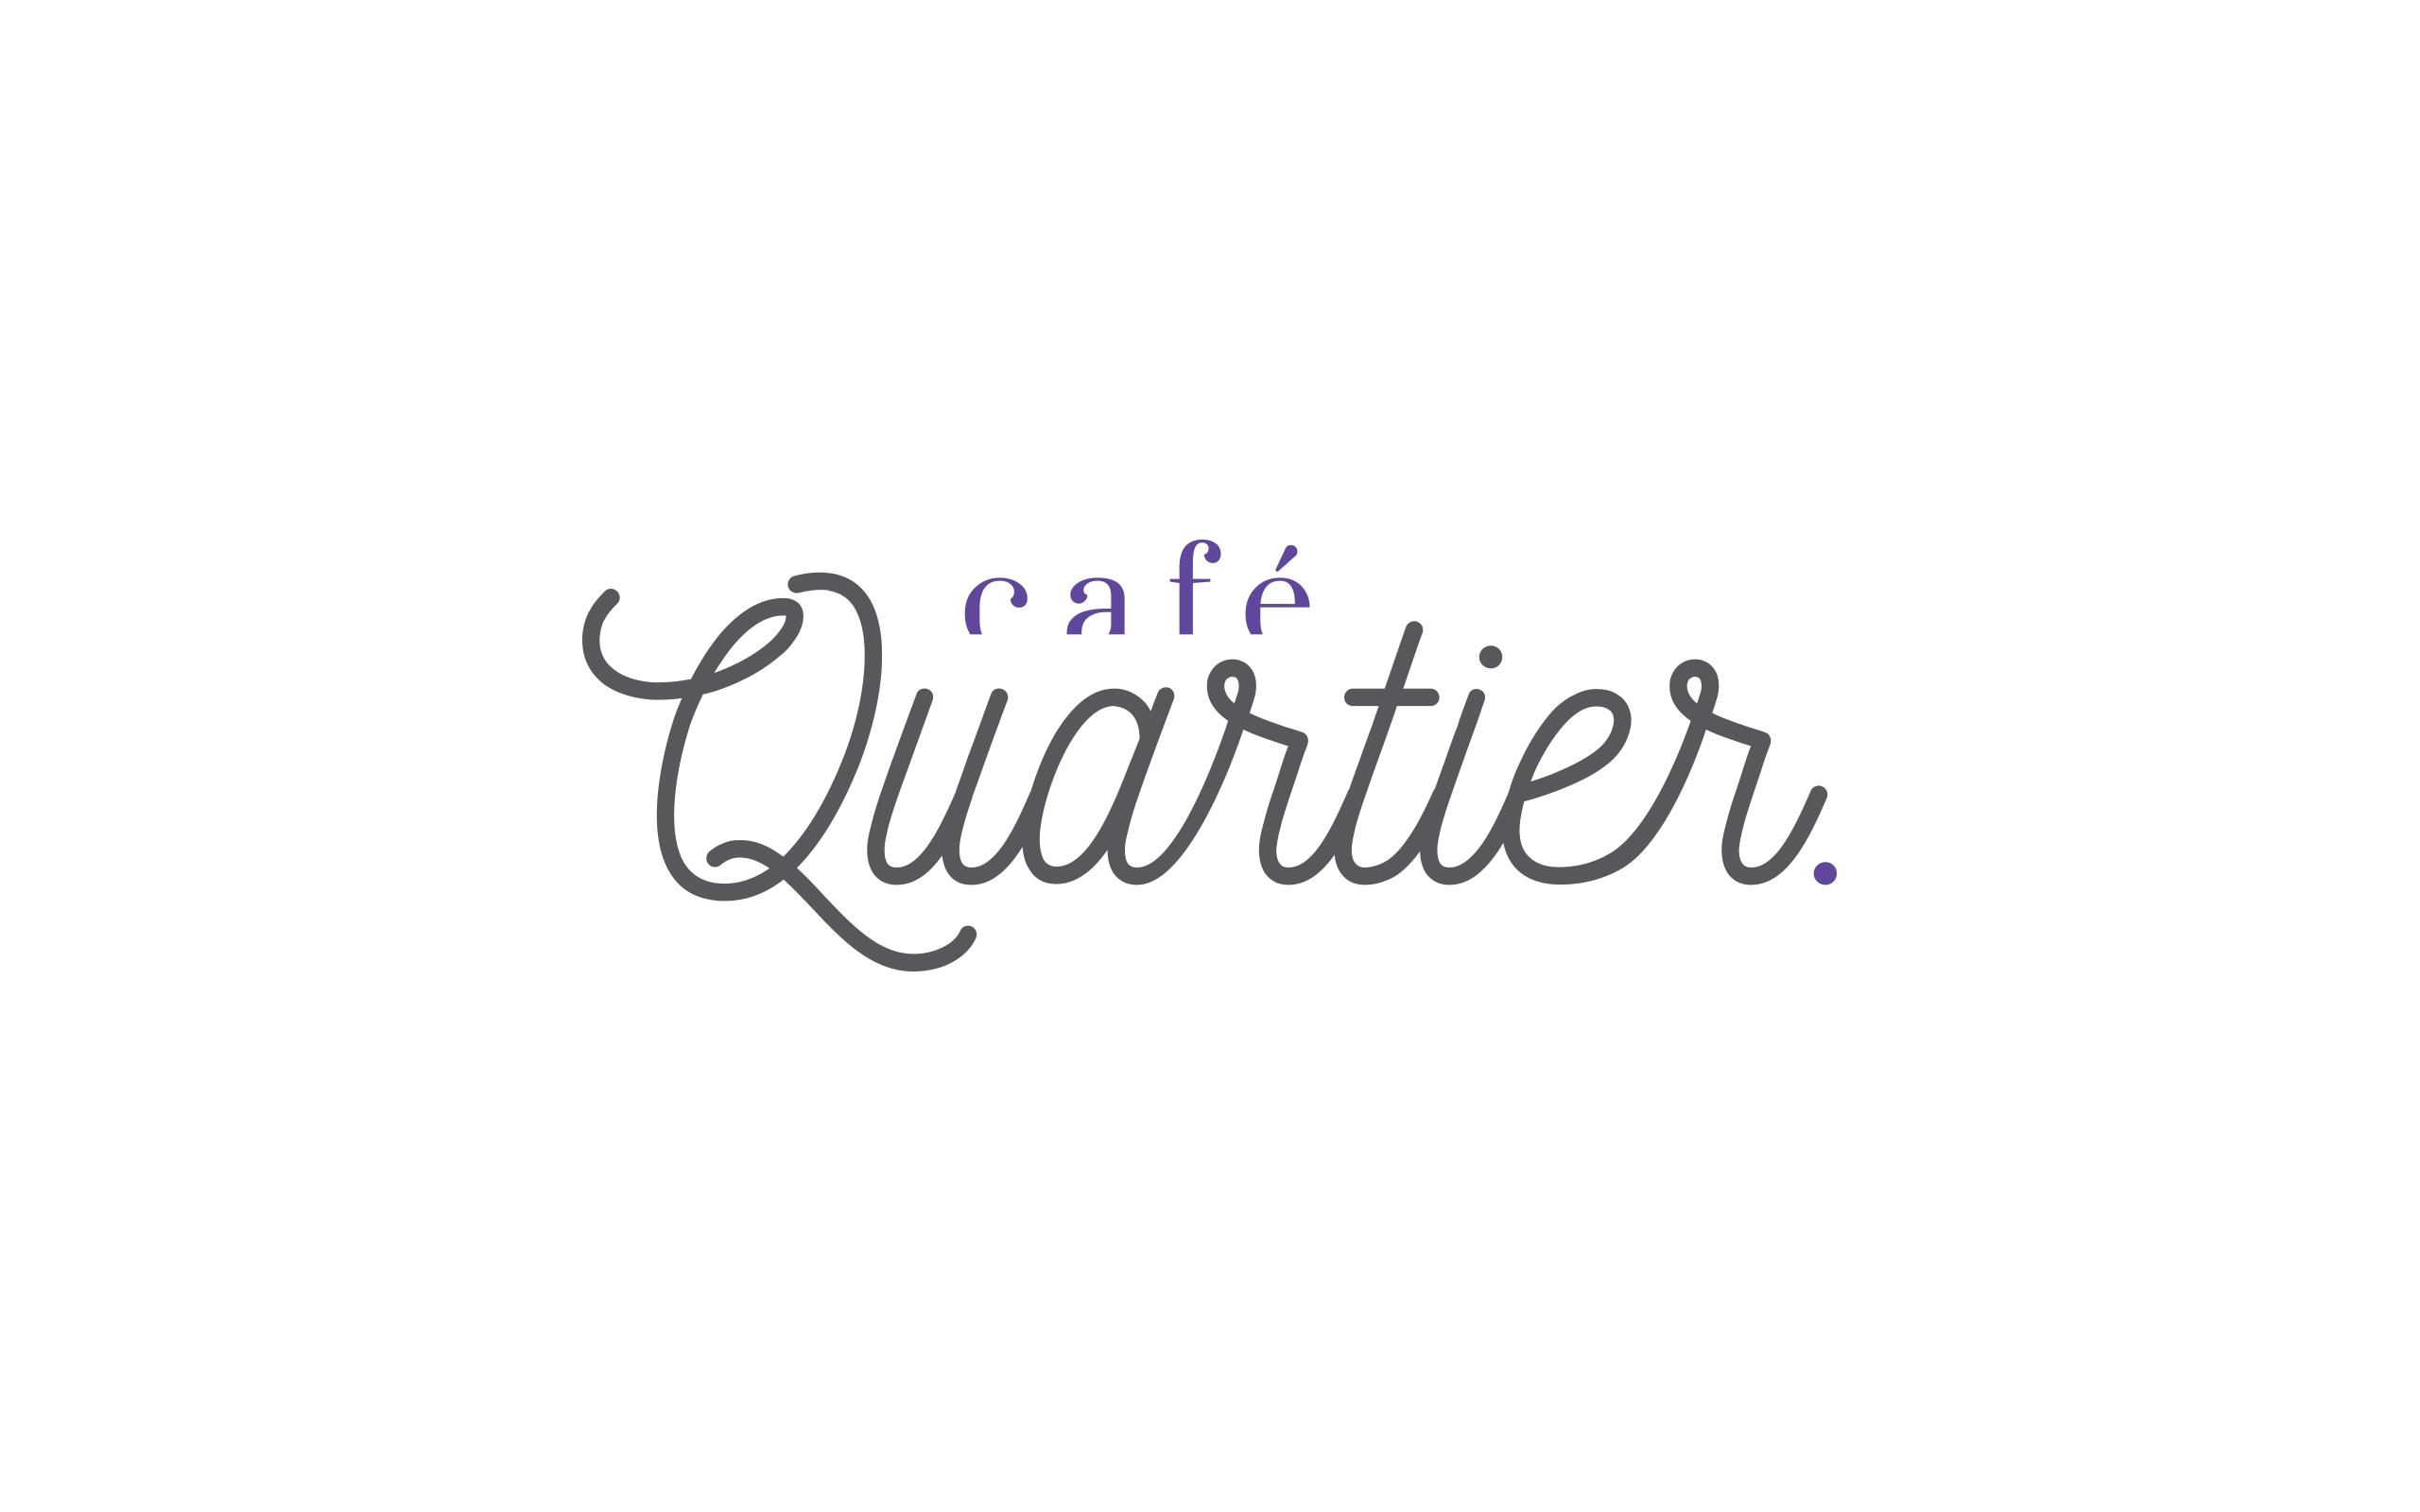 Identité Café Quartier